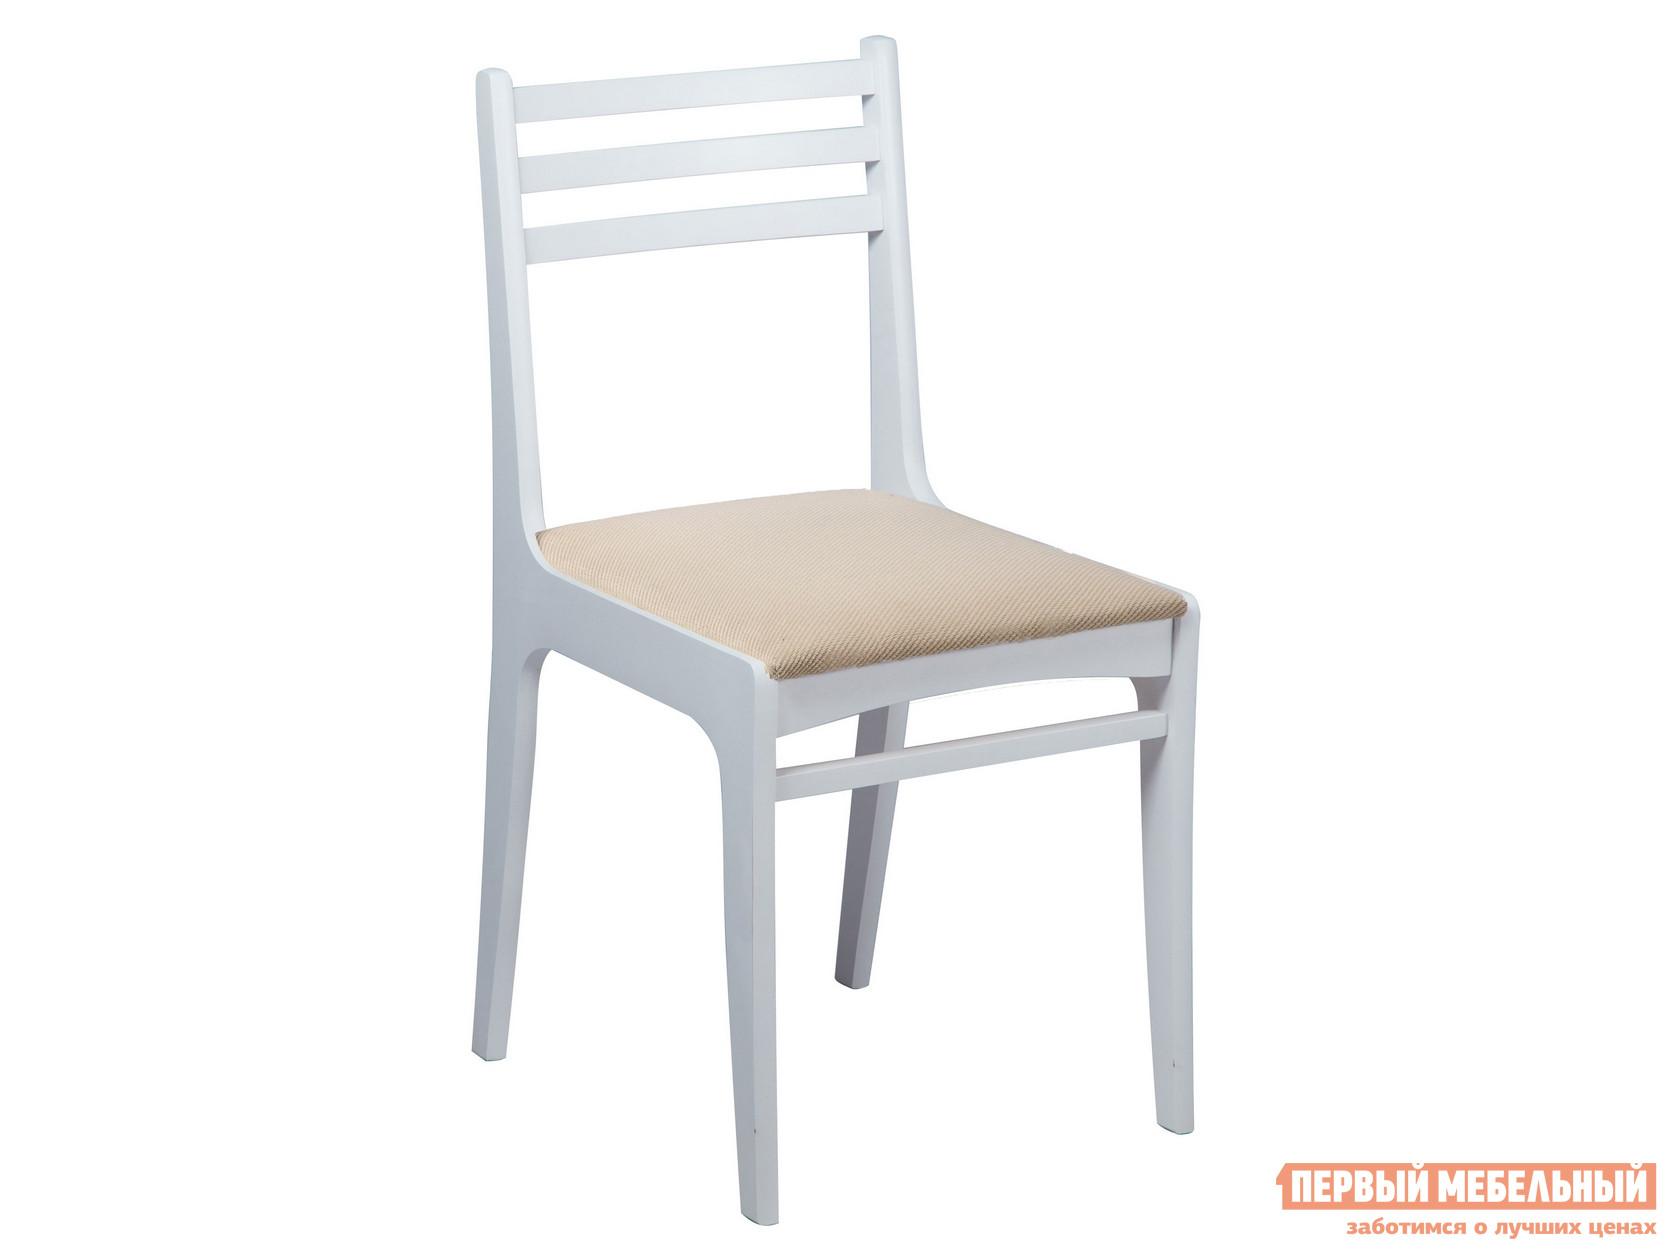 Стул  Грис (С8) Белая эмаль / Аполло Беж Мебвилл 127345